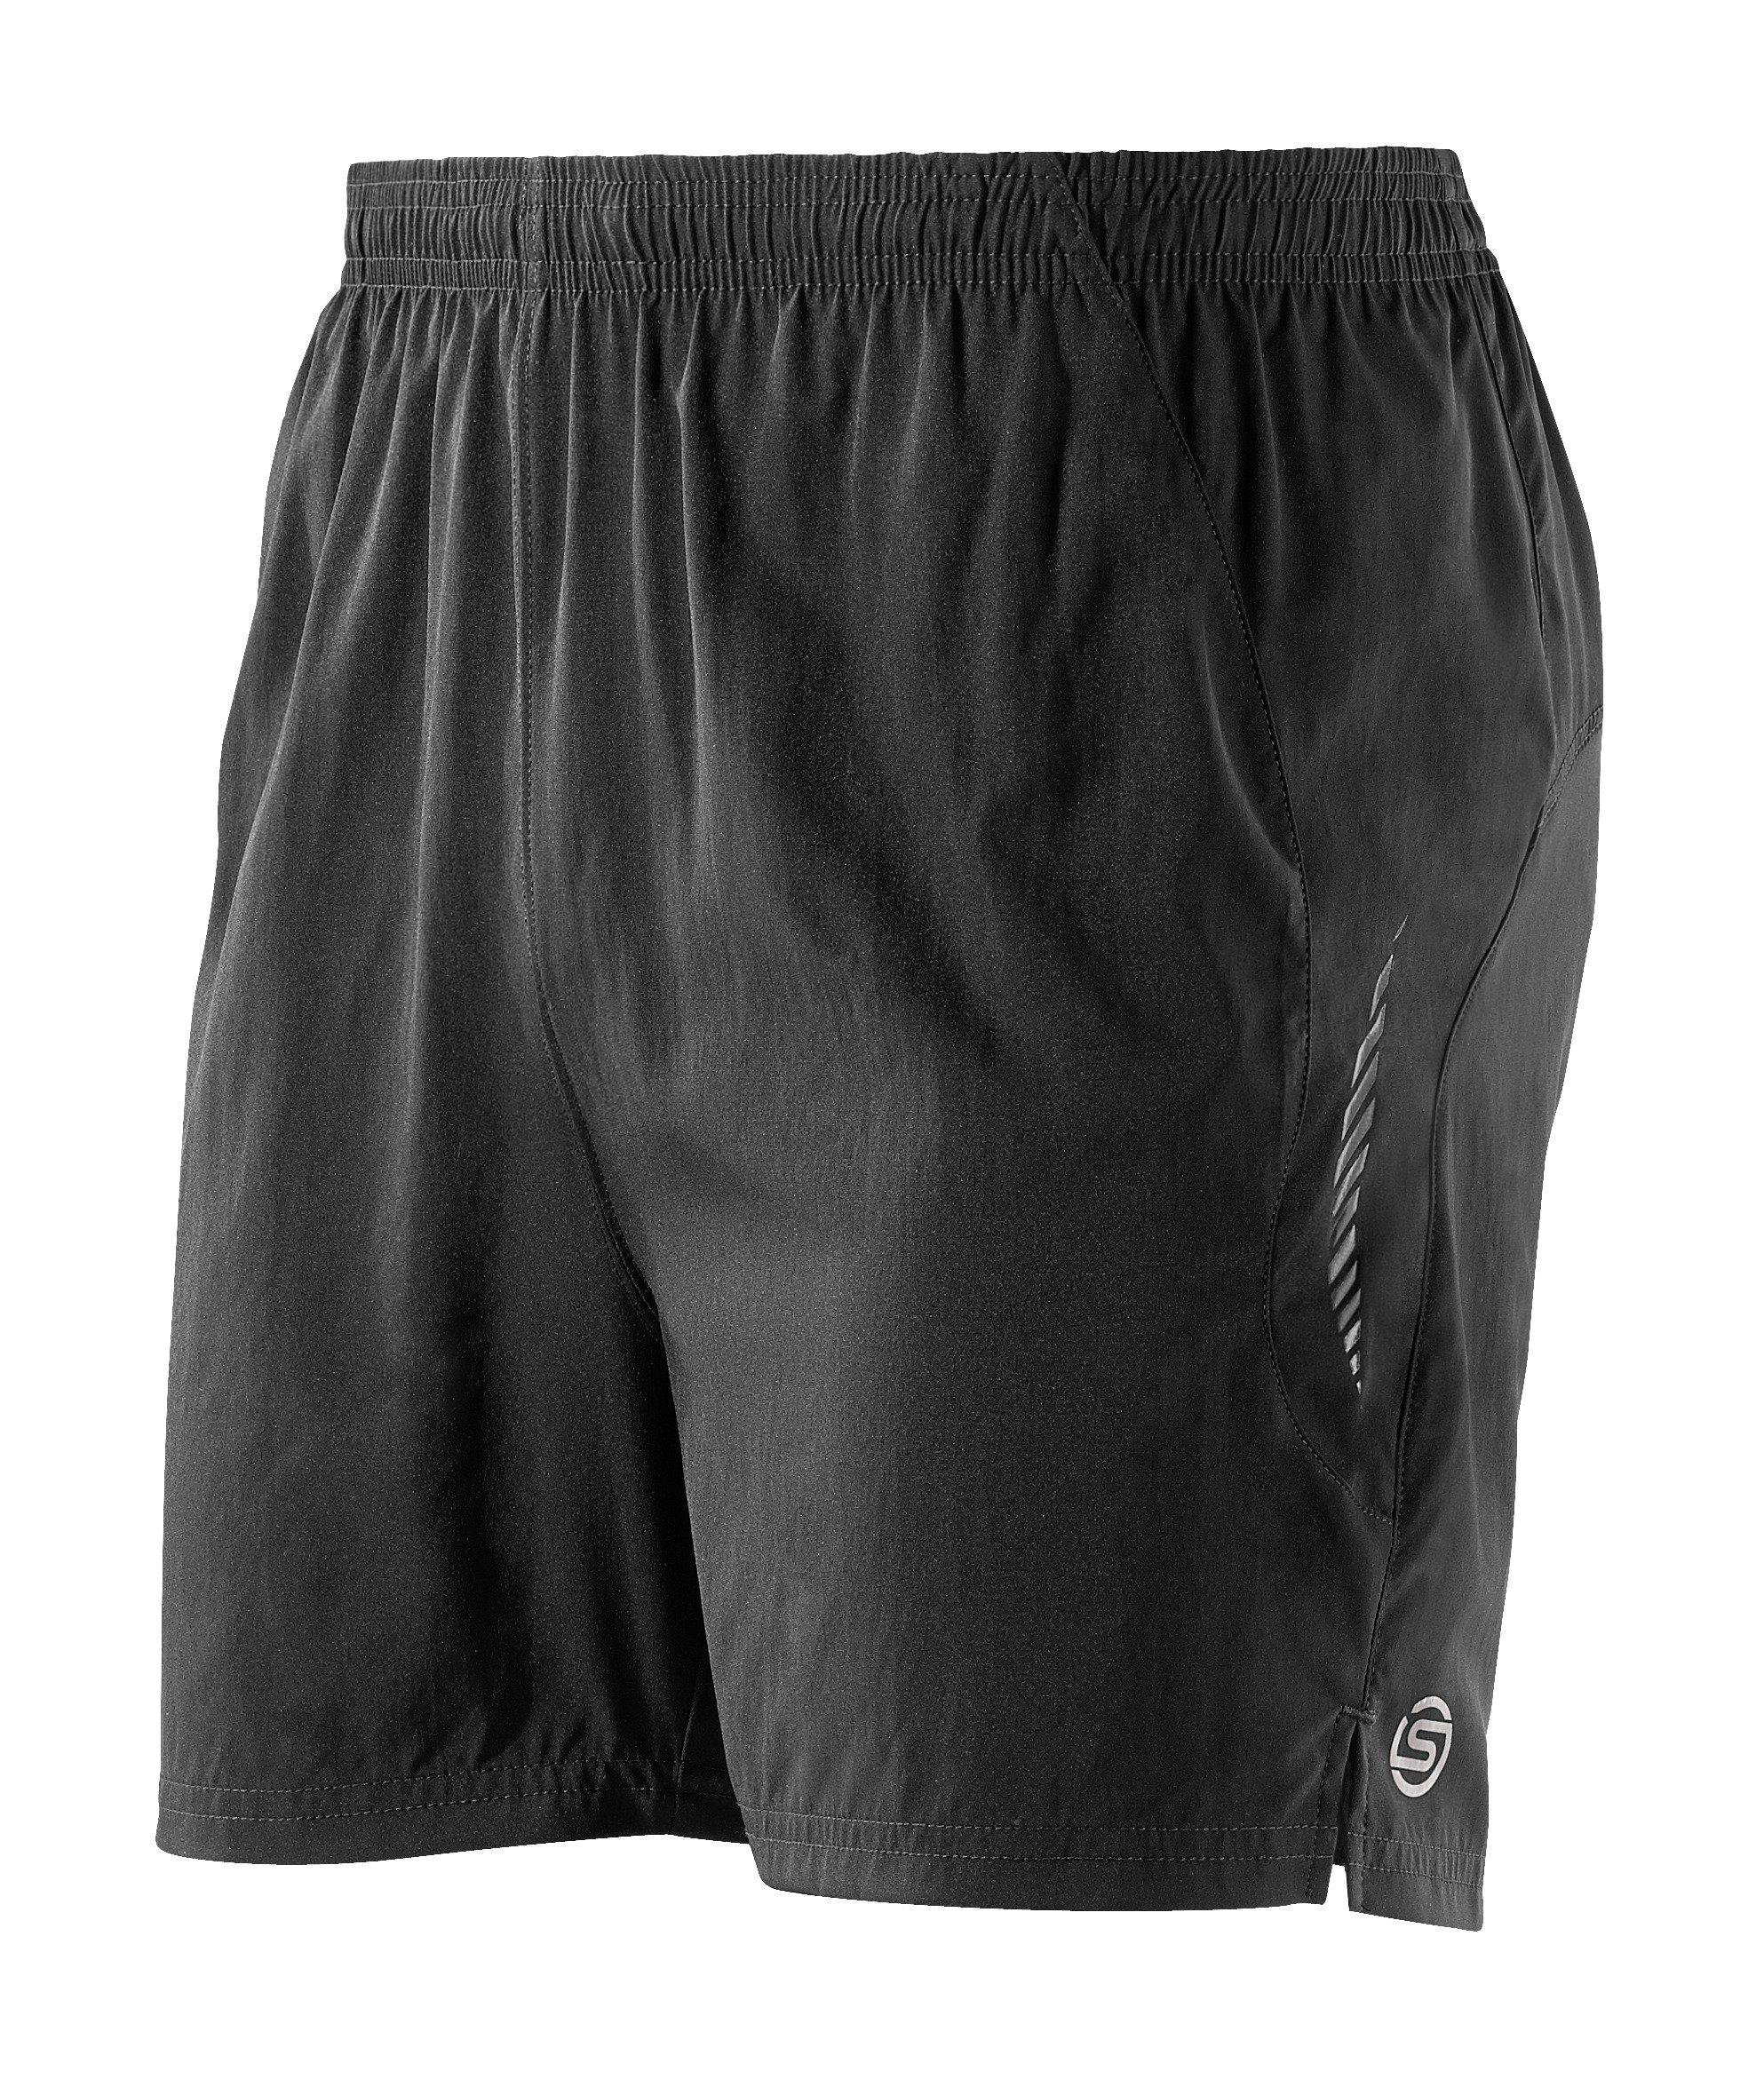 Skins Short NCG Pace 5 M v�tement running homme